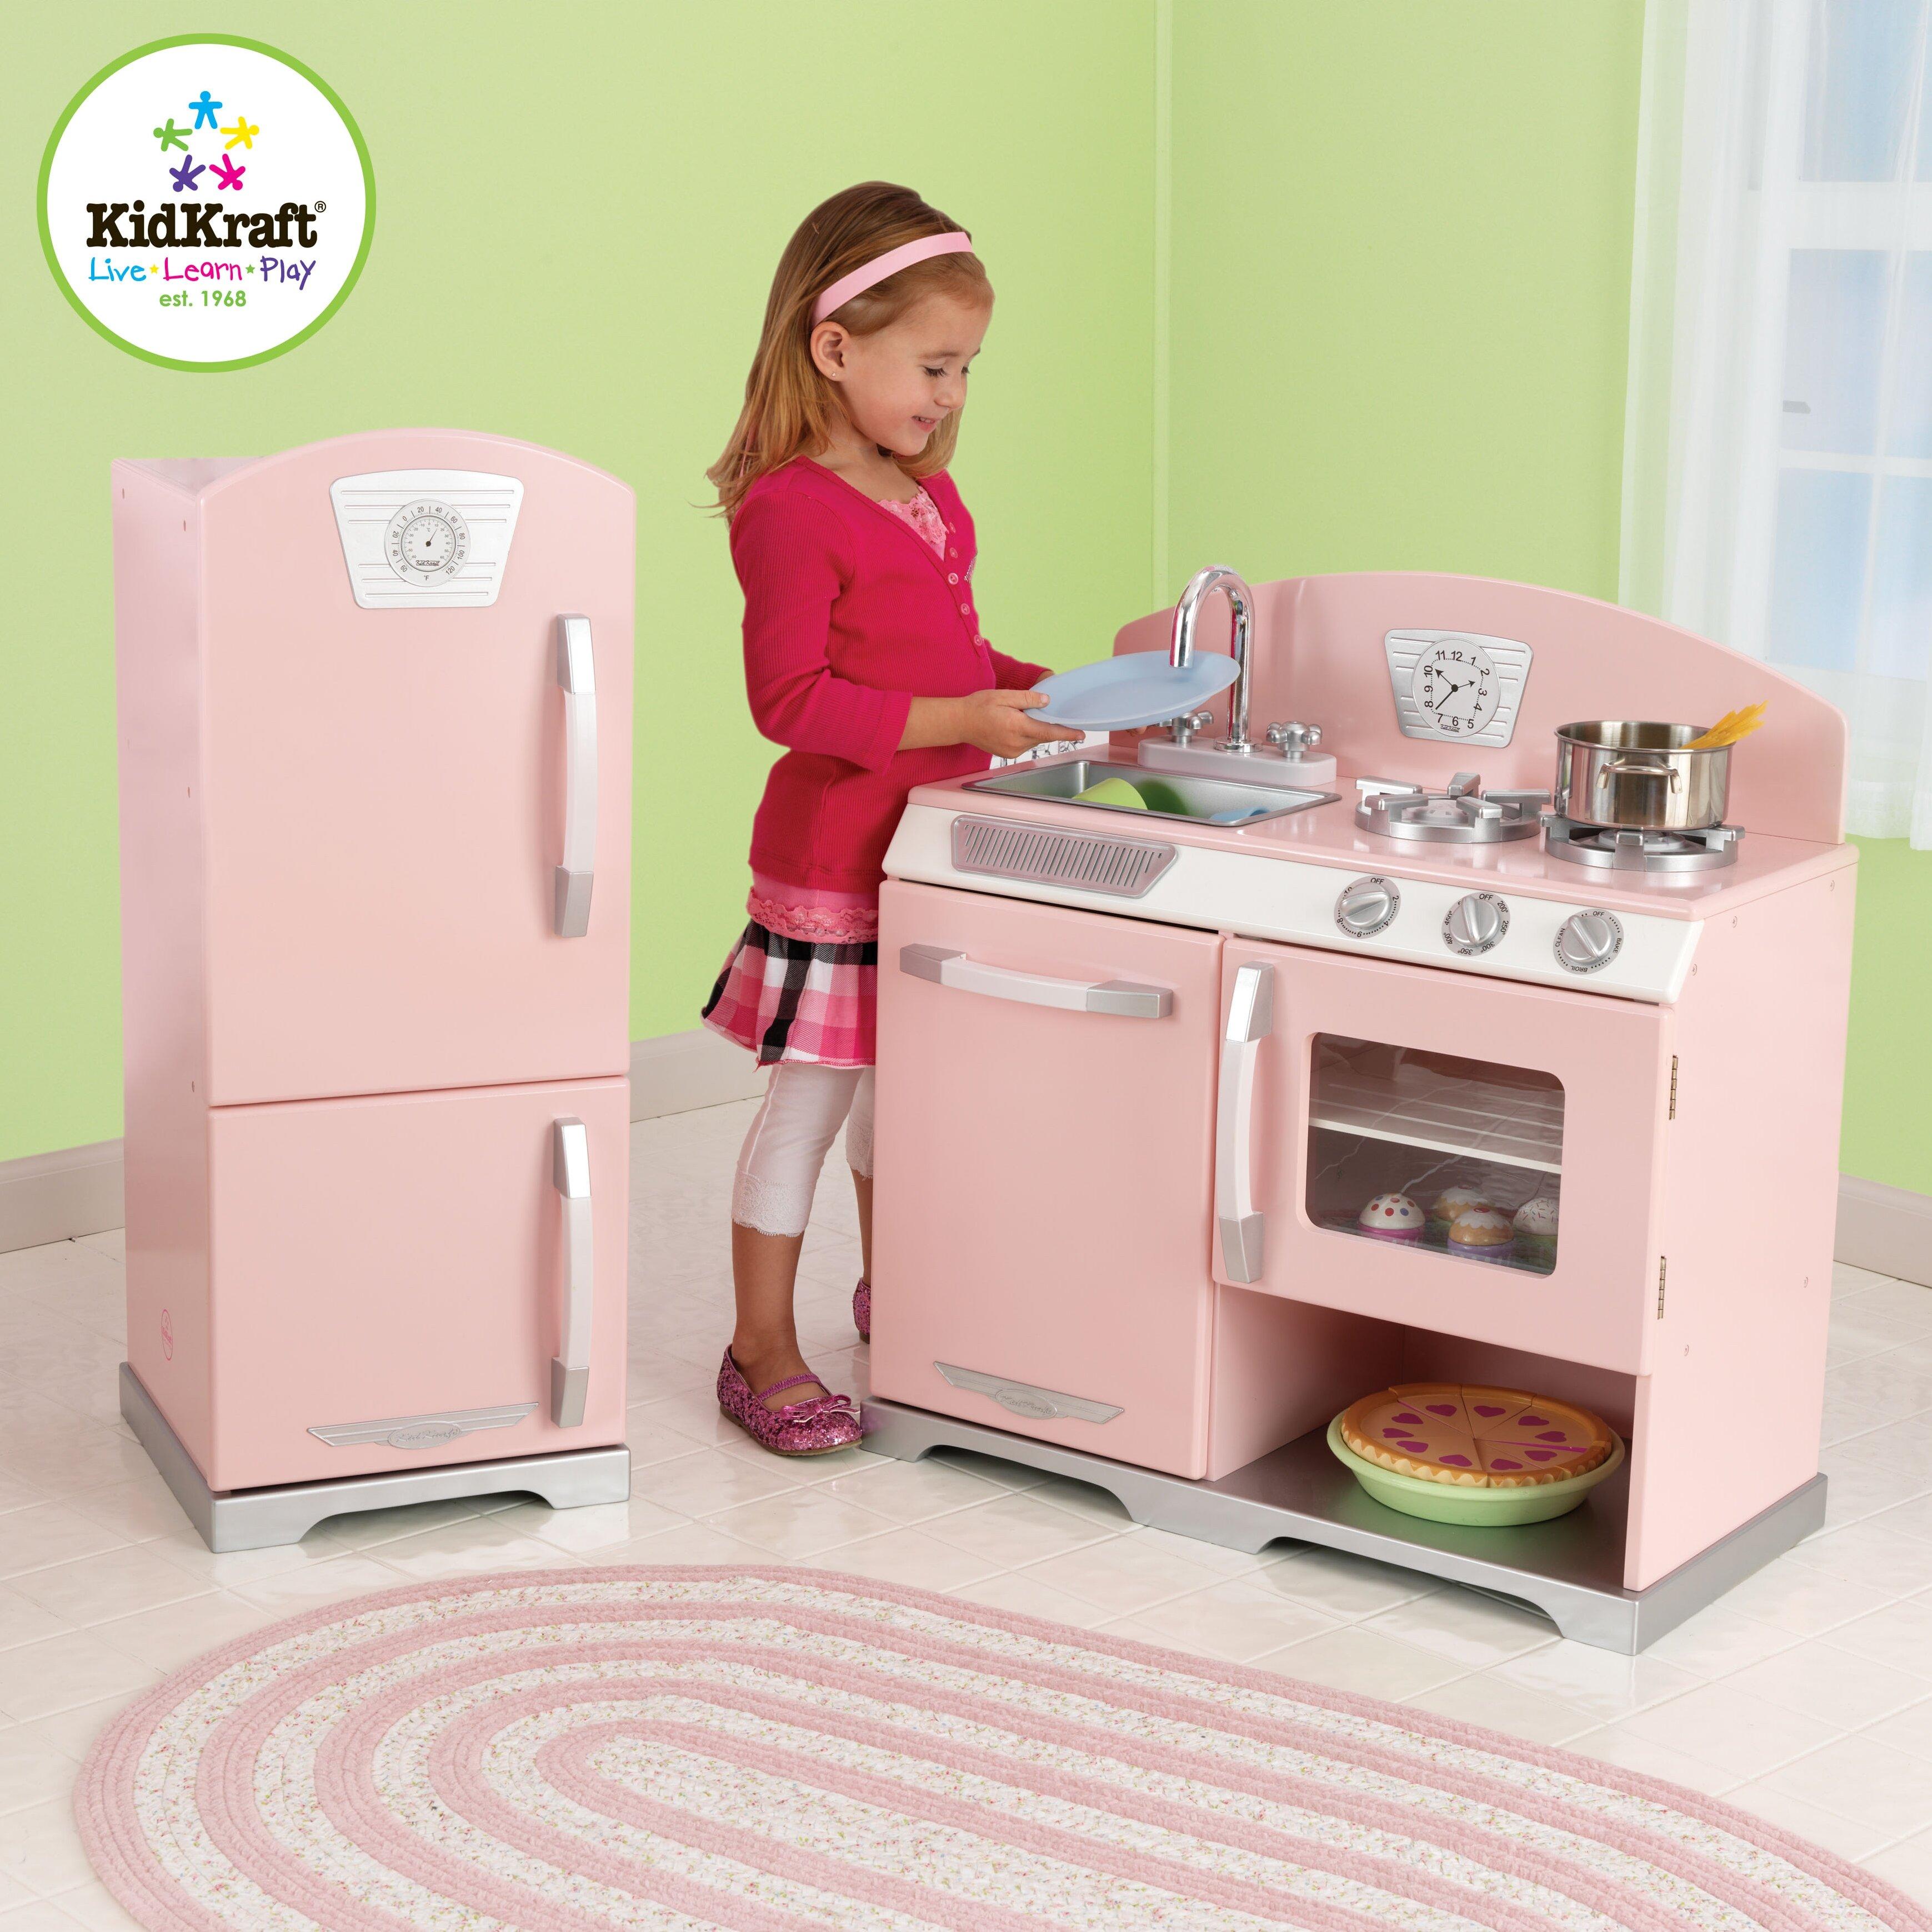 kidkraft 2 piece retro kitchen and refrigerator set. Black Bedroom Furniture Sets. Home Design Ideas